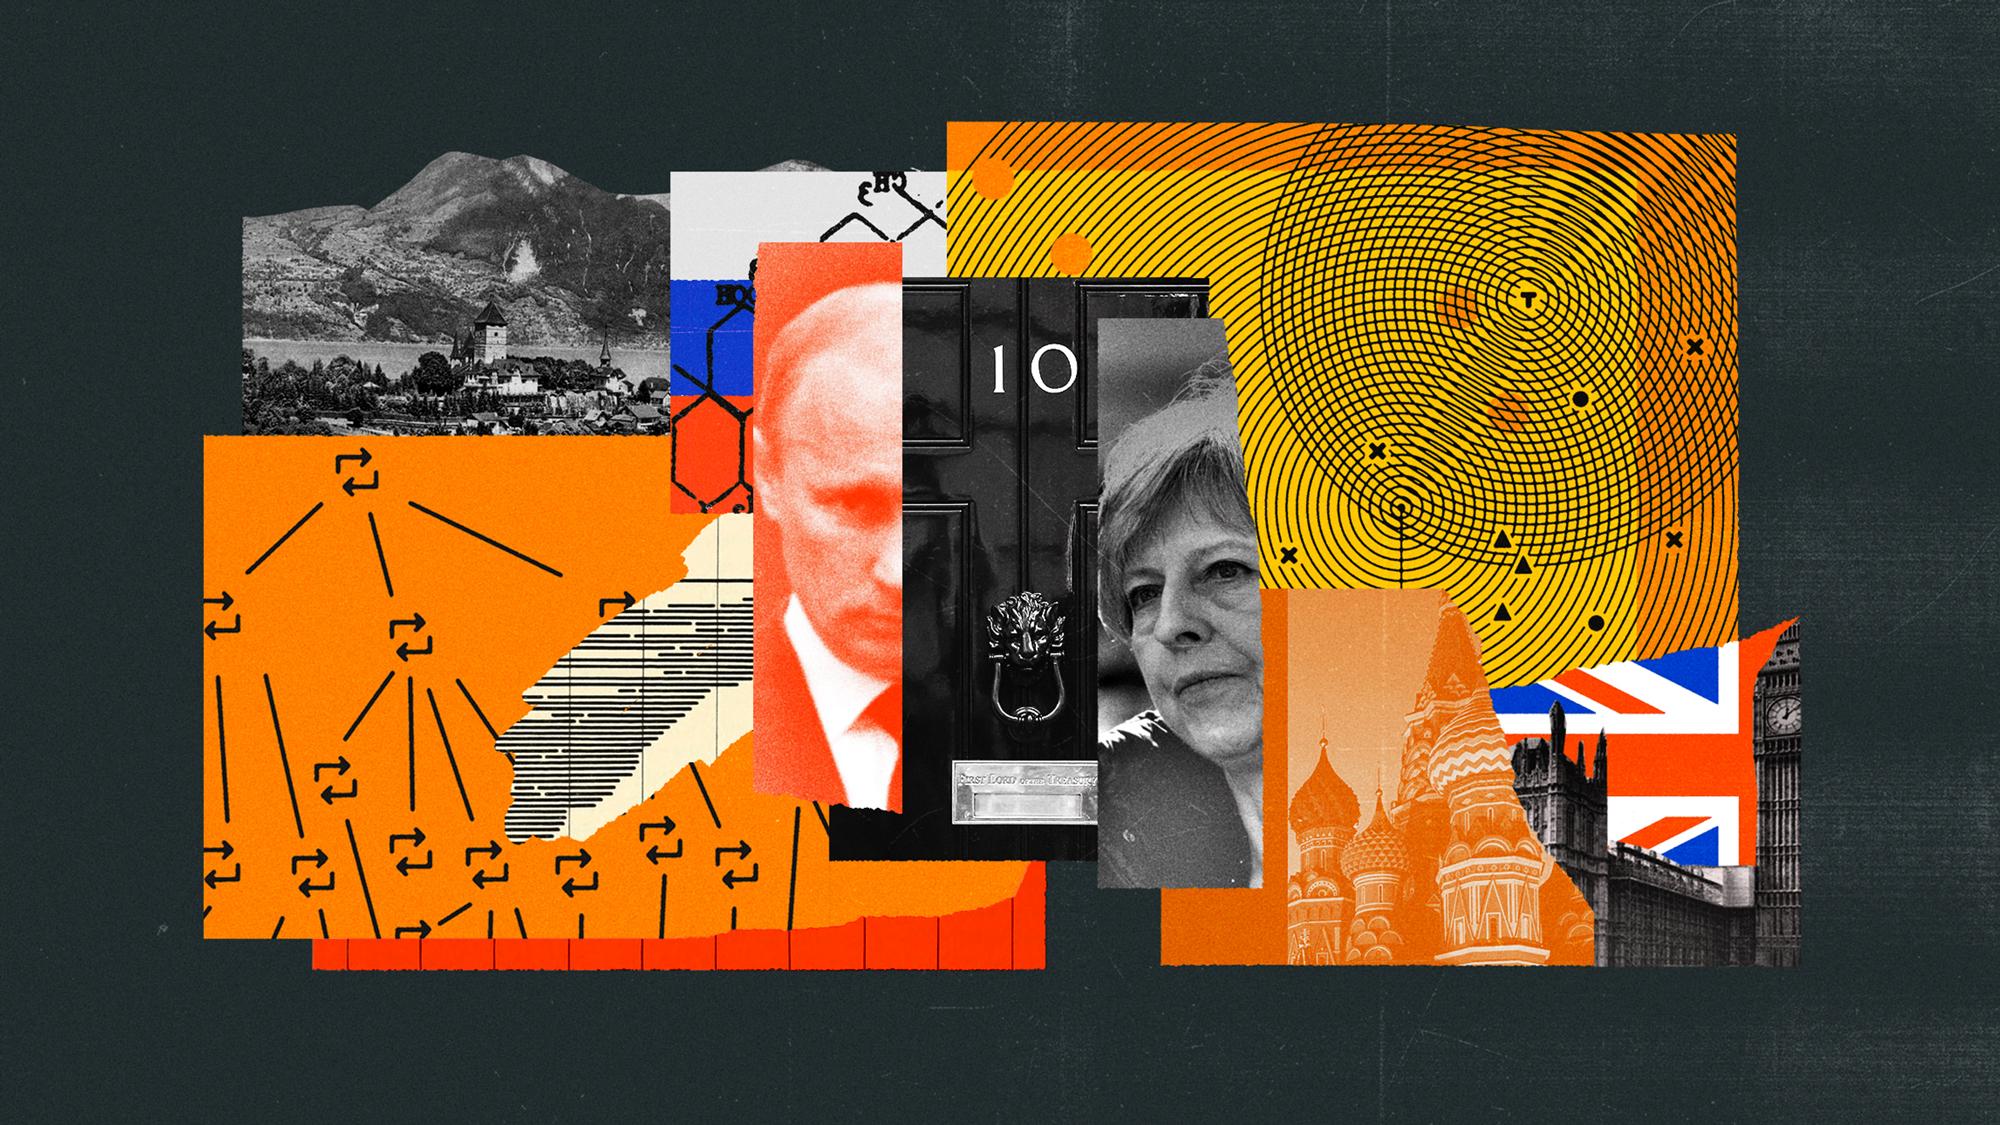 online betting sites politics and war